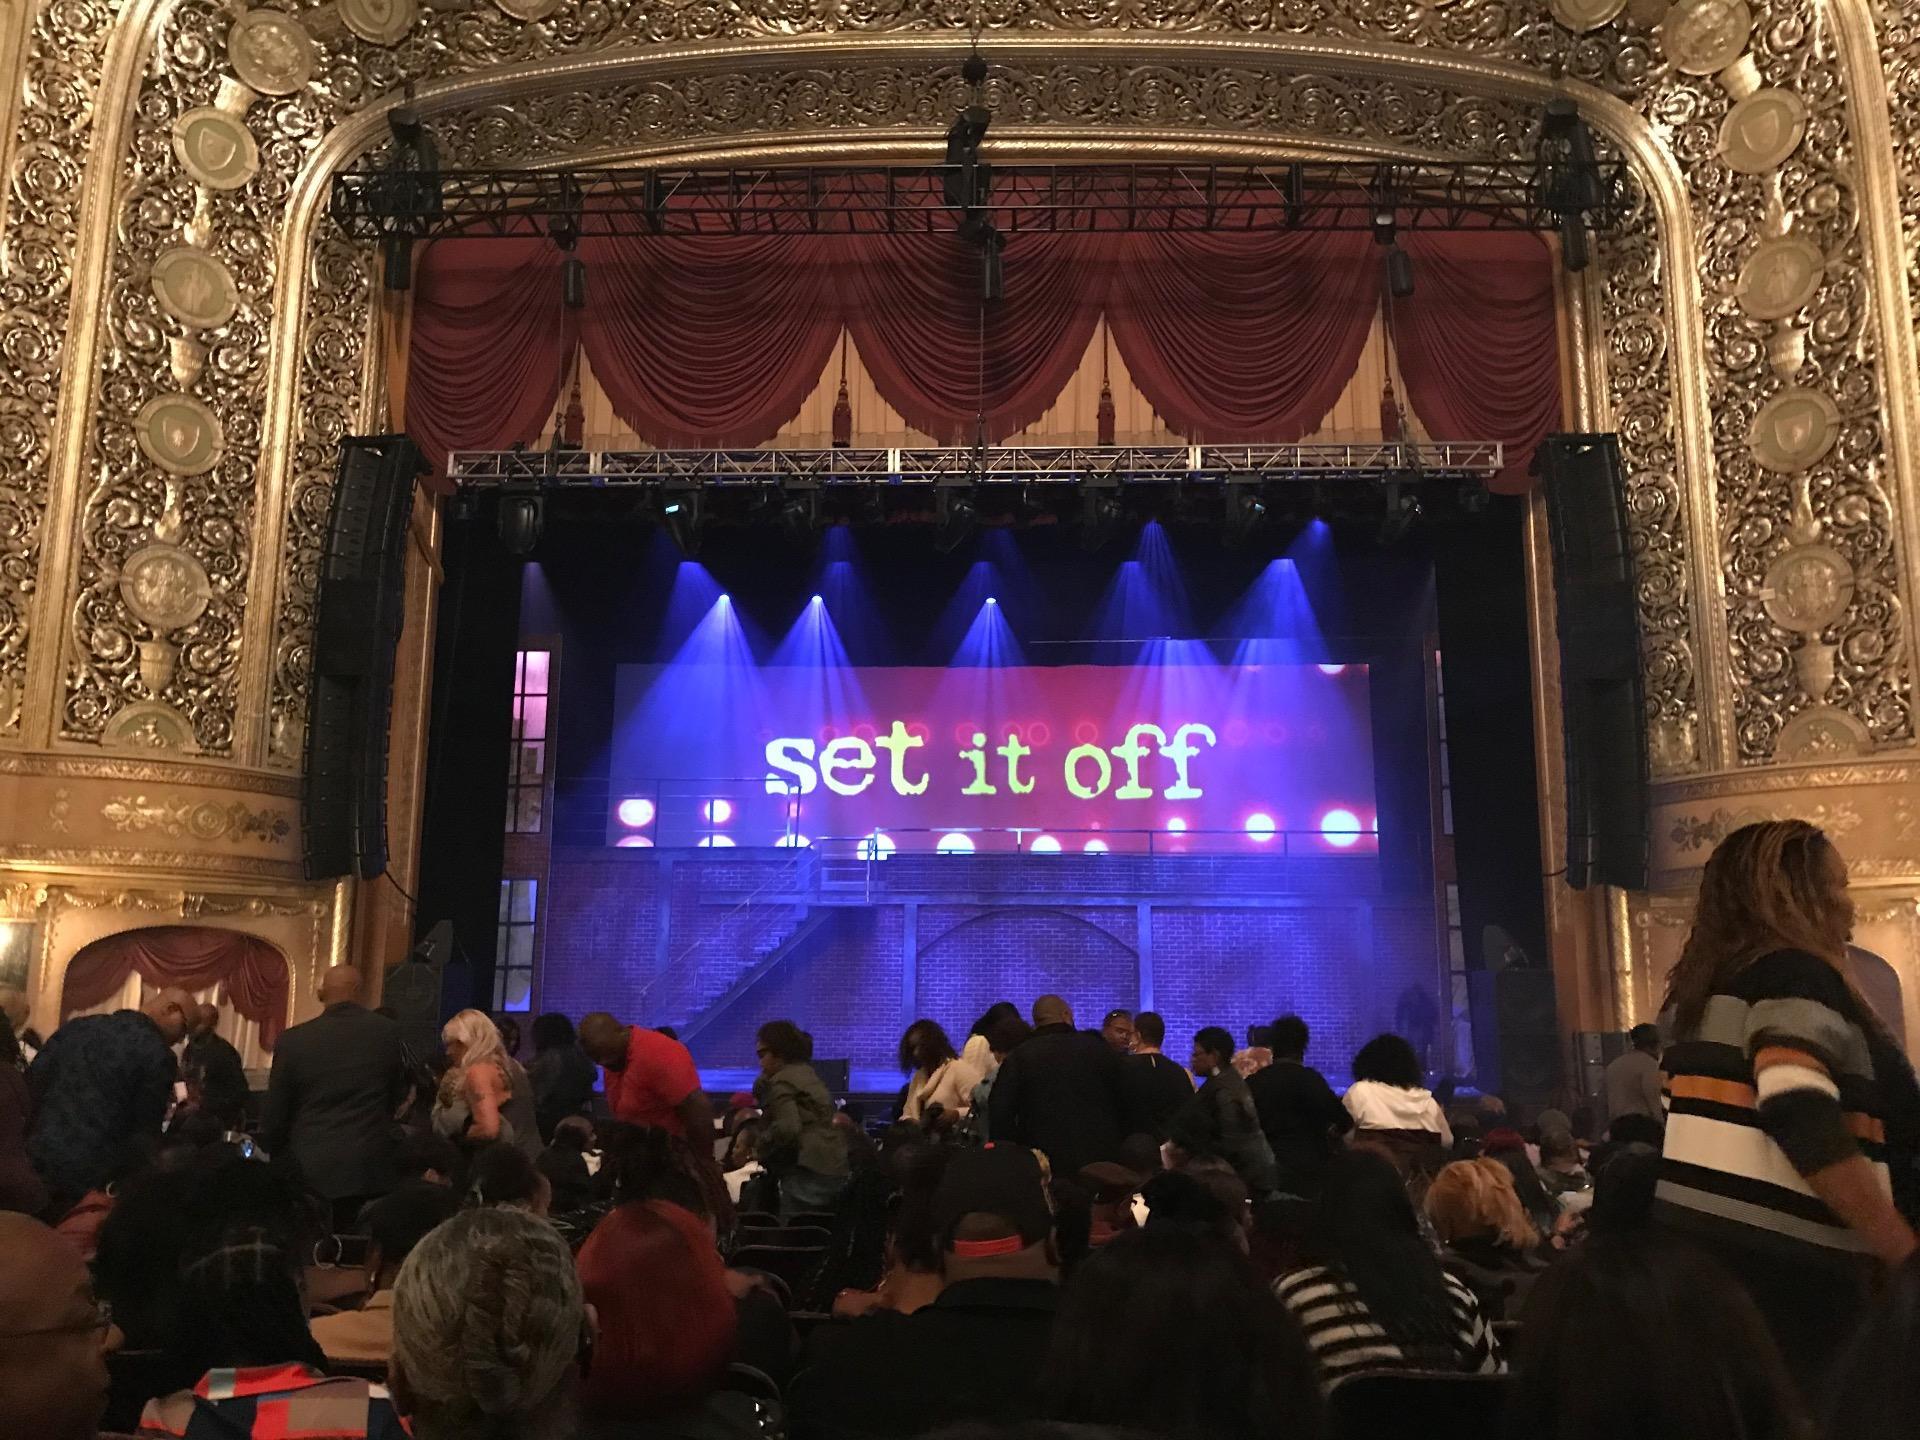 Warner Theatre (Washington, D.C.) Section Orch Row Q Seat 113